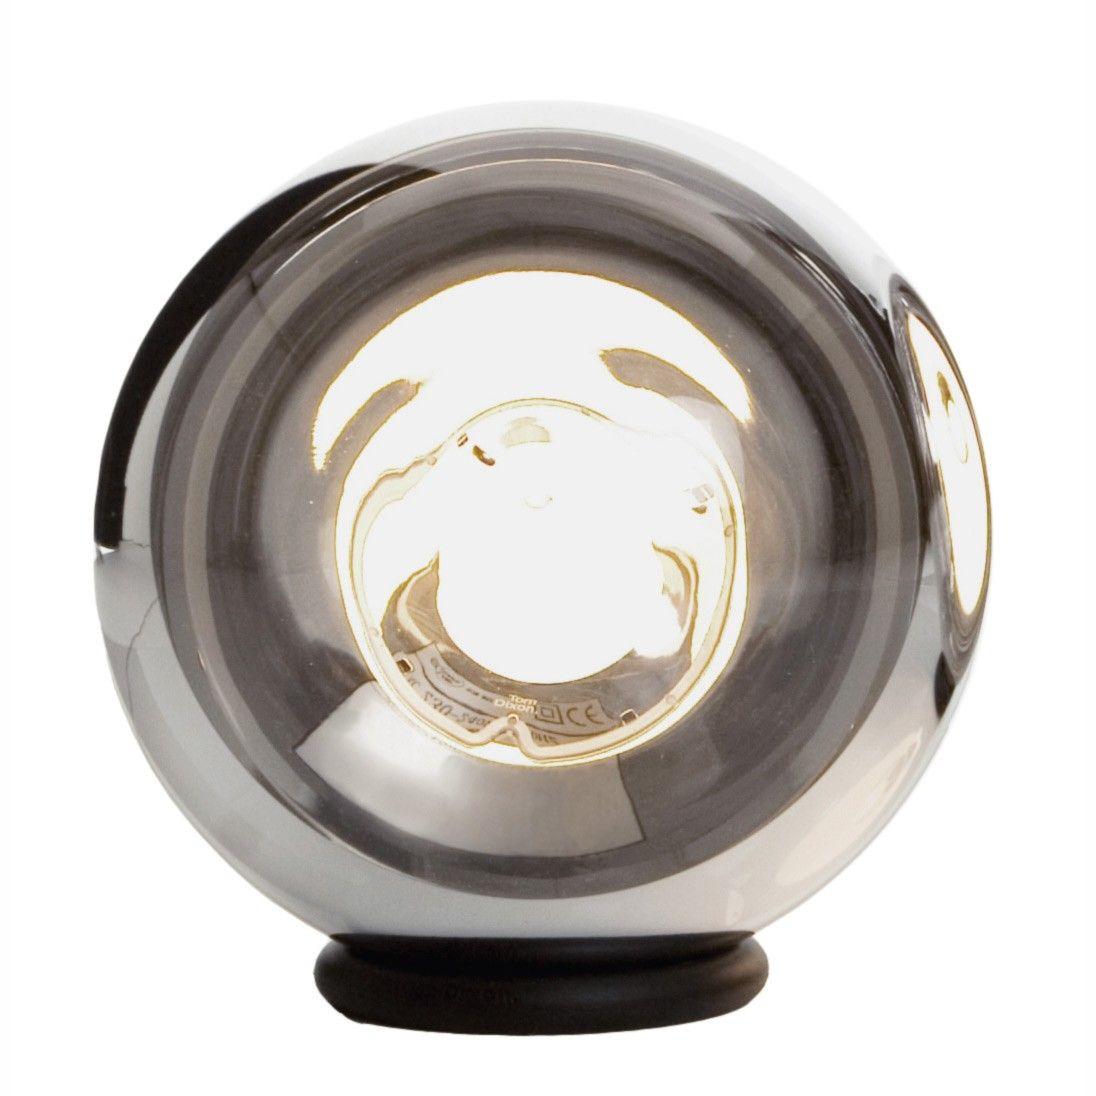 Tom Dixon Mirror 40 Floor Lamp Chrome Silver Mbb40a Feum 430 00 Tom Dixon Mirror Ball Floor Lamp